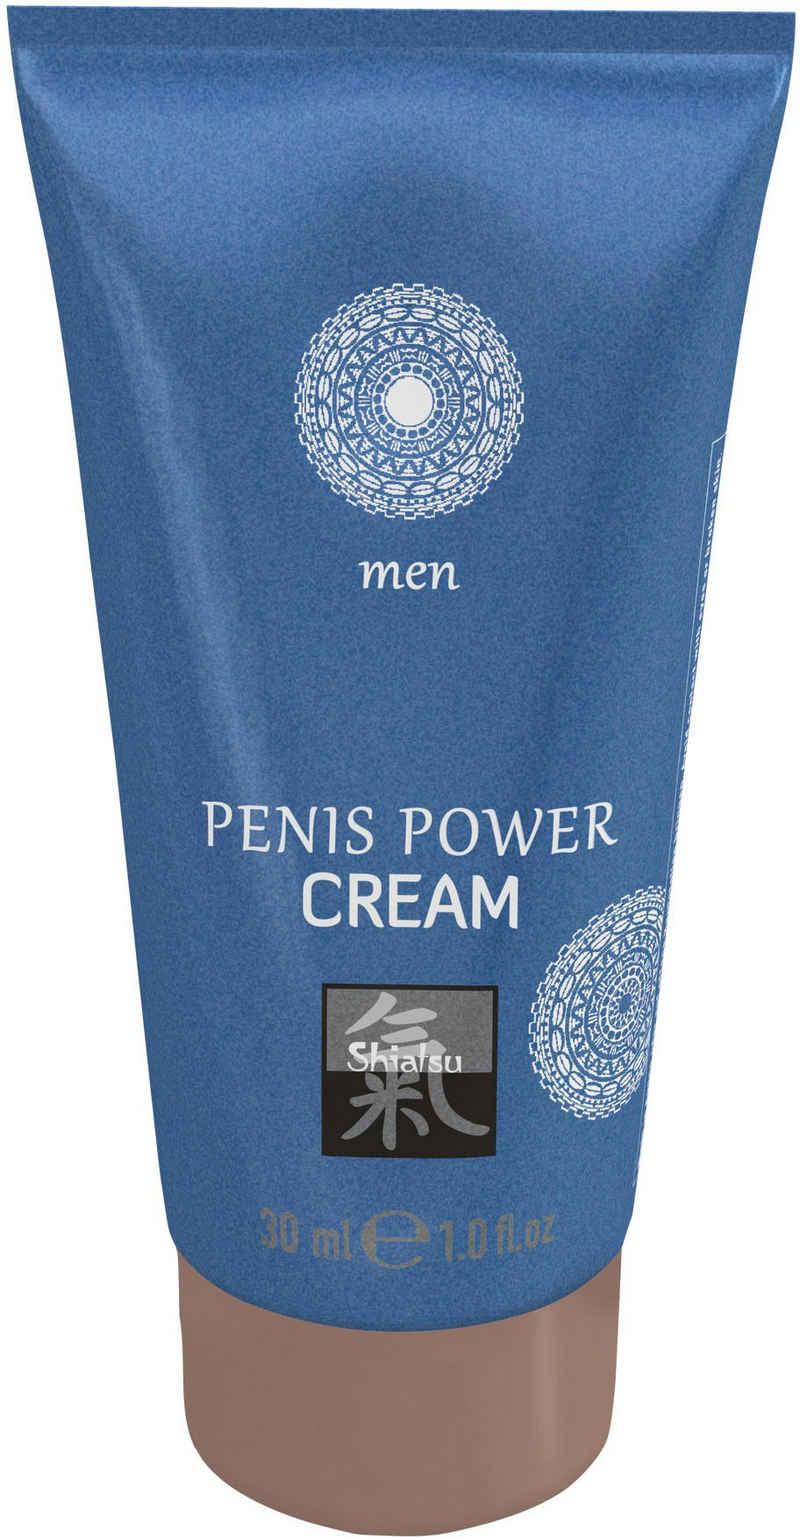 Shiatsu Intimcreme, Penis Power Cream